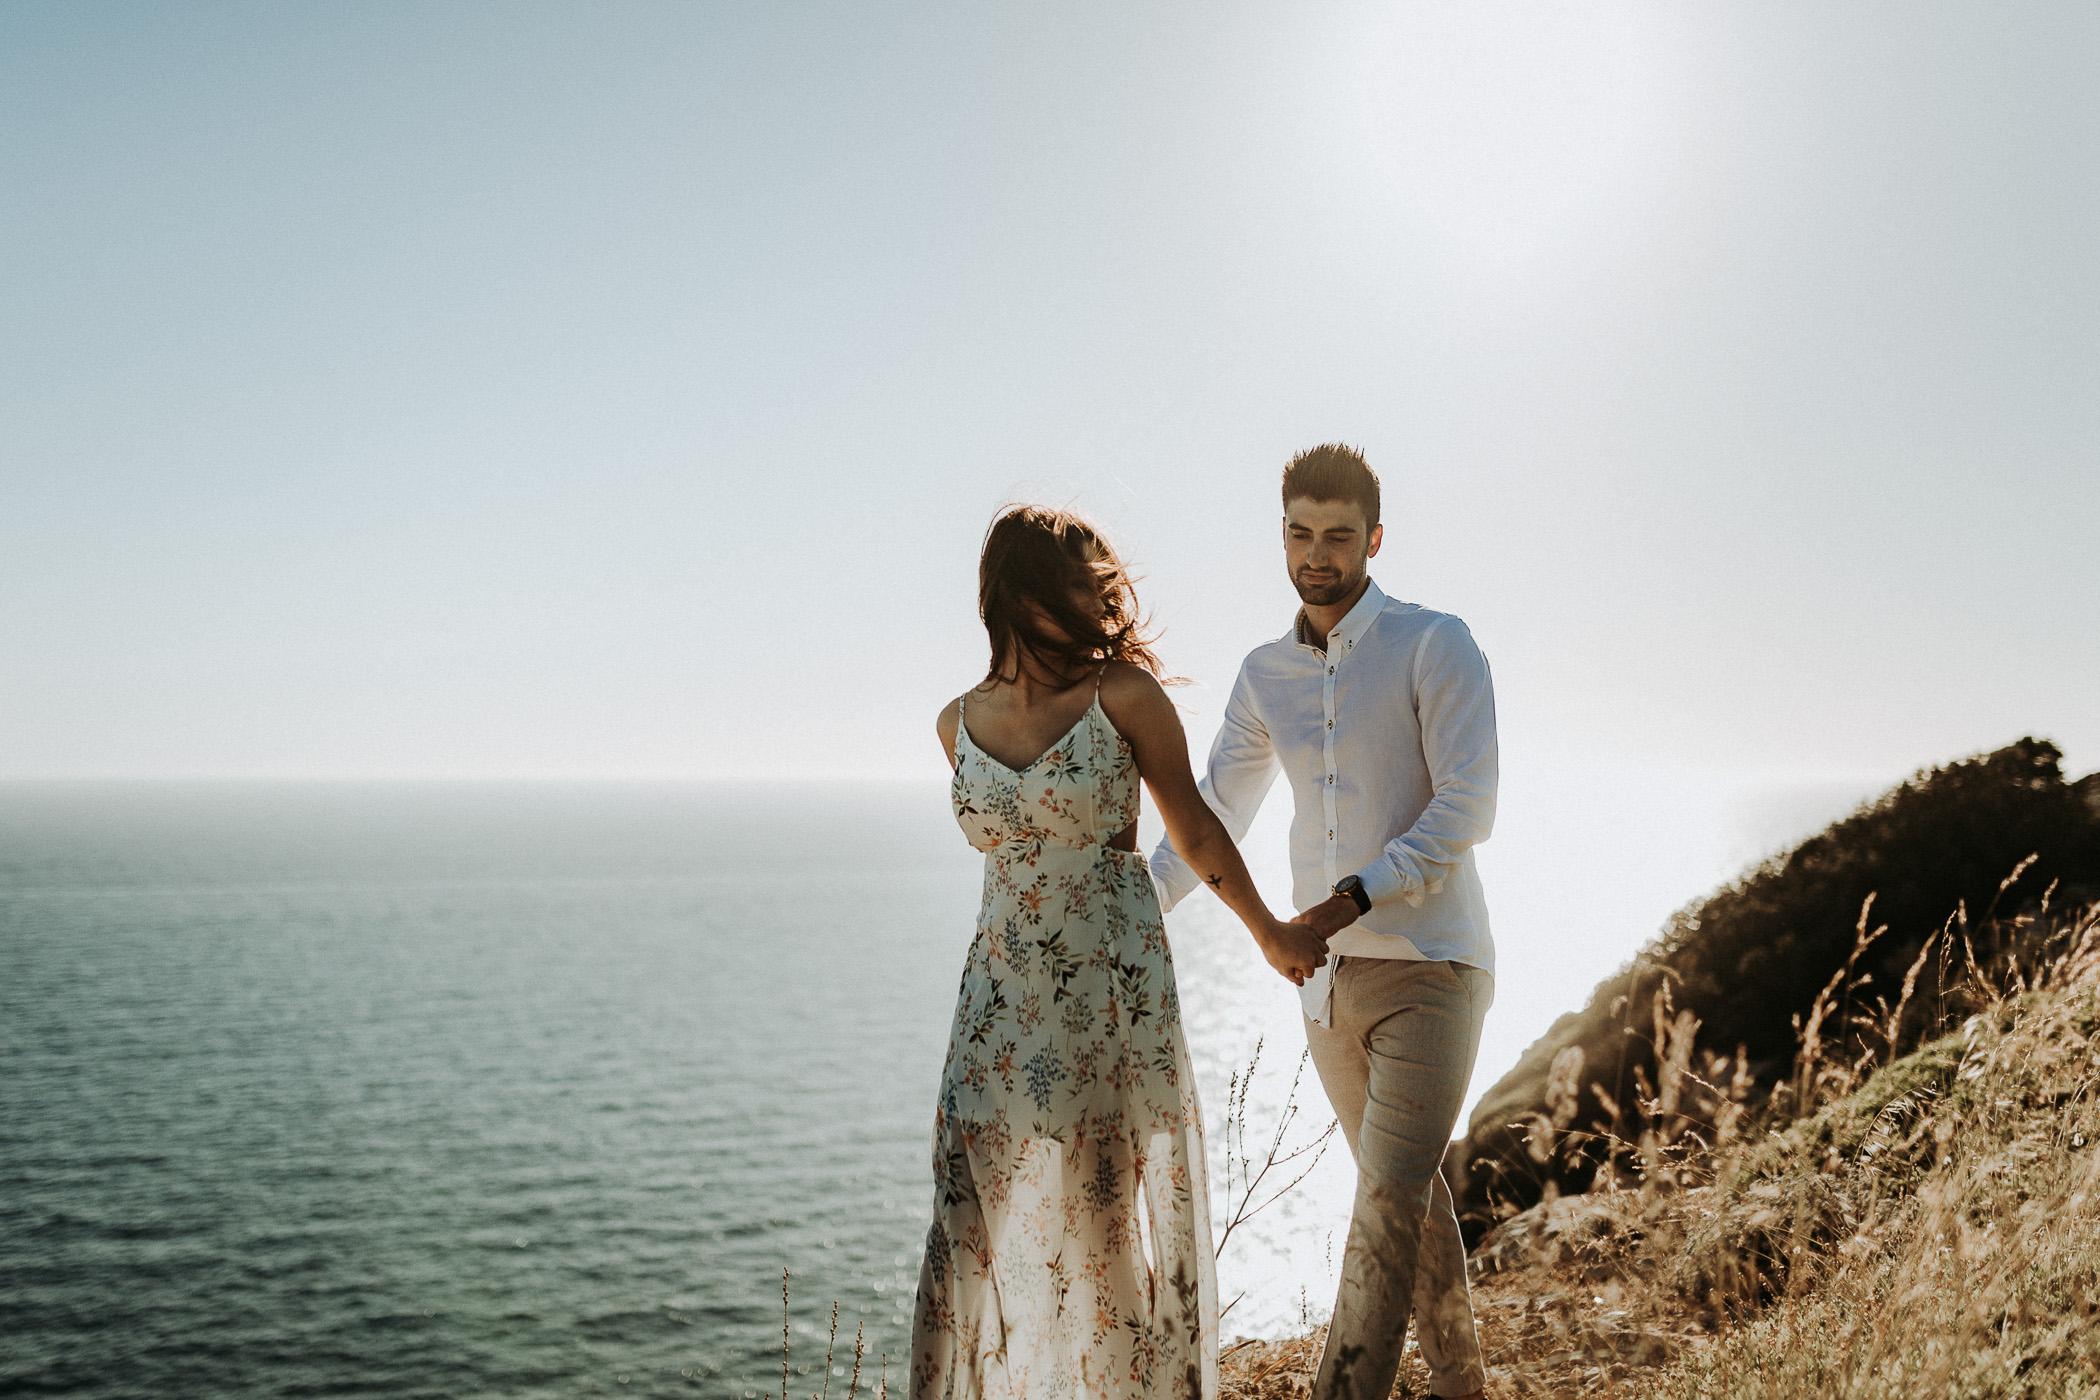 DanielaMarquardtPhotography_wedding_elopement_mallorca_spain_calapi_palma_lauraandtoni_290